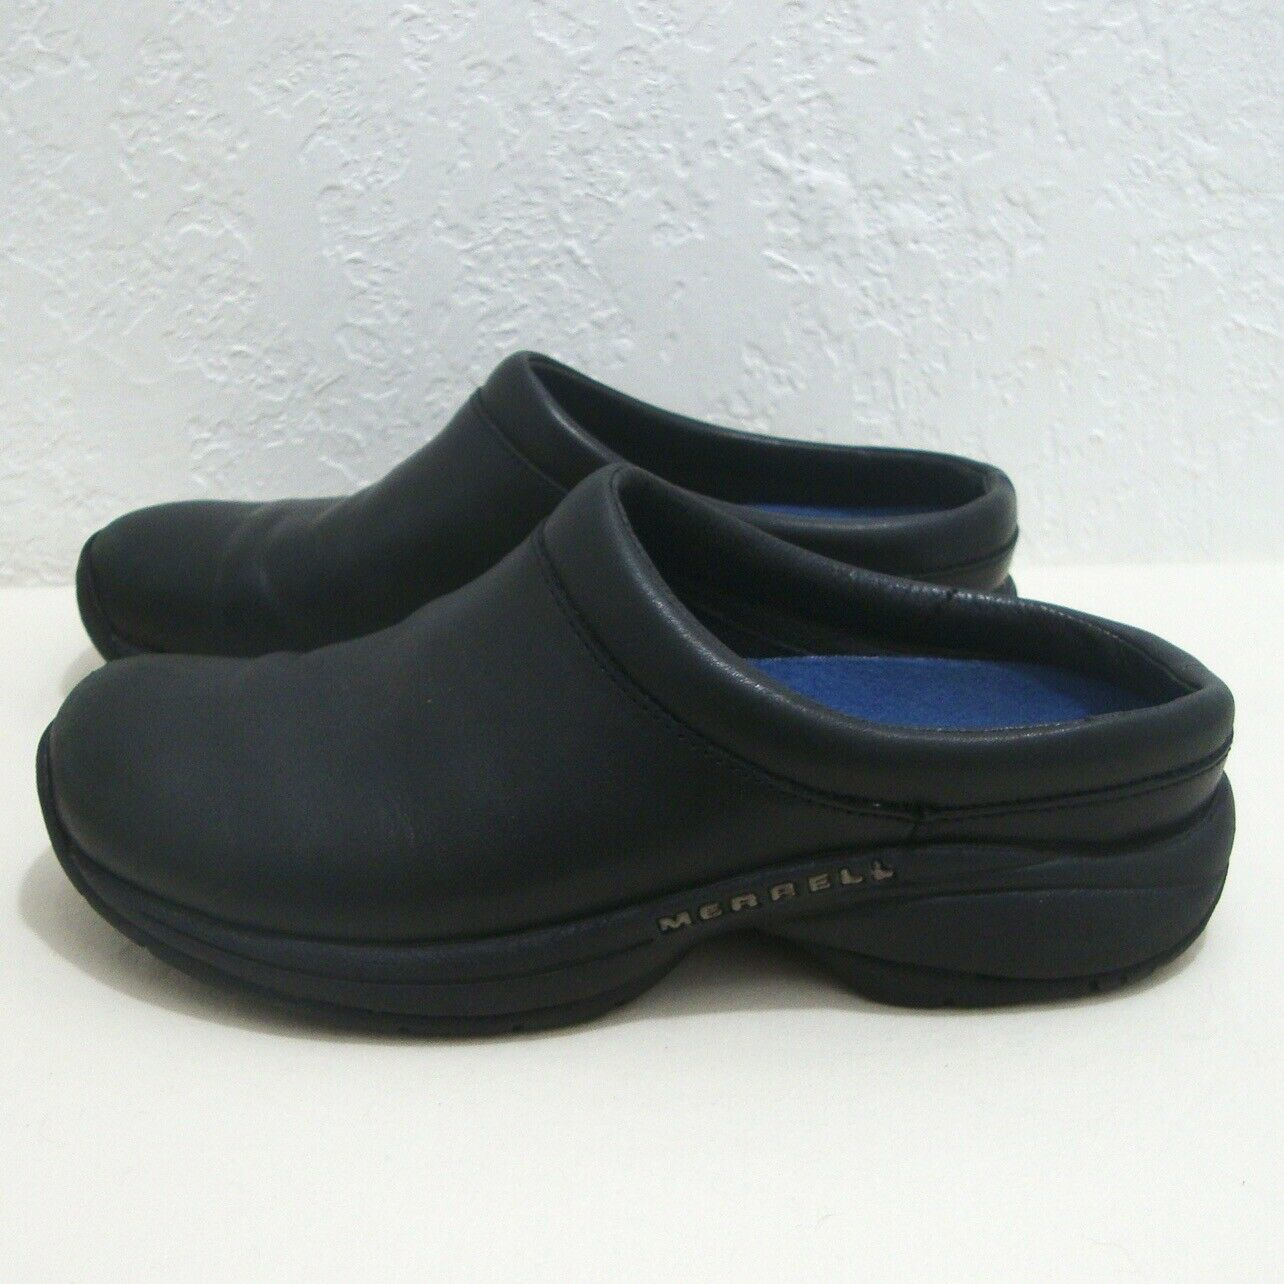 MERRELL Clogs Black Leather Air Cushion Performance Uniform Slide Shoe Women 7.5